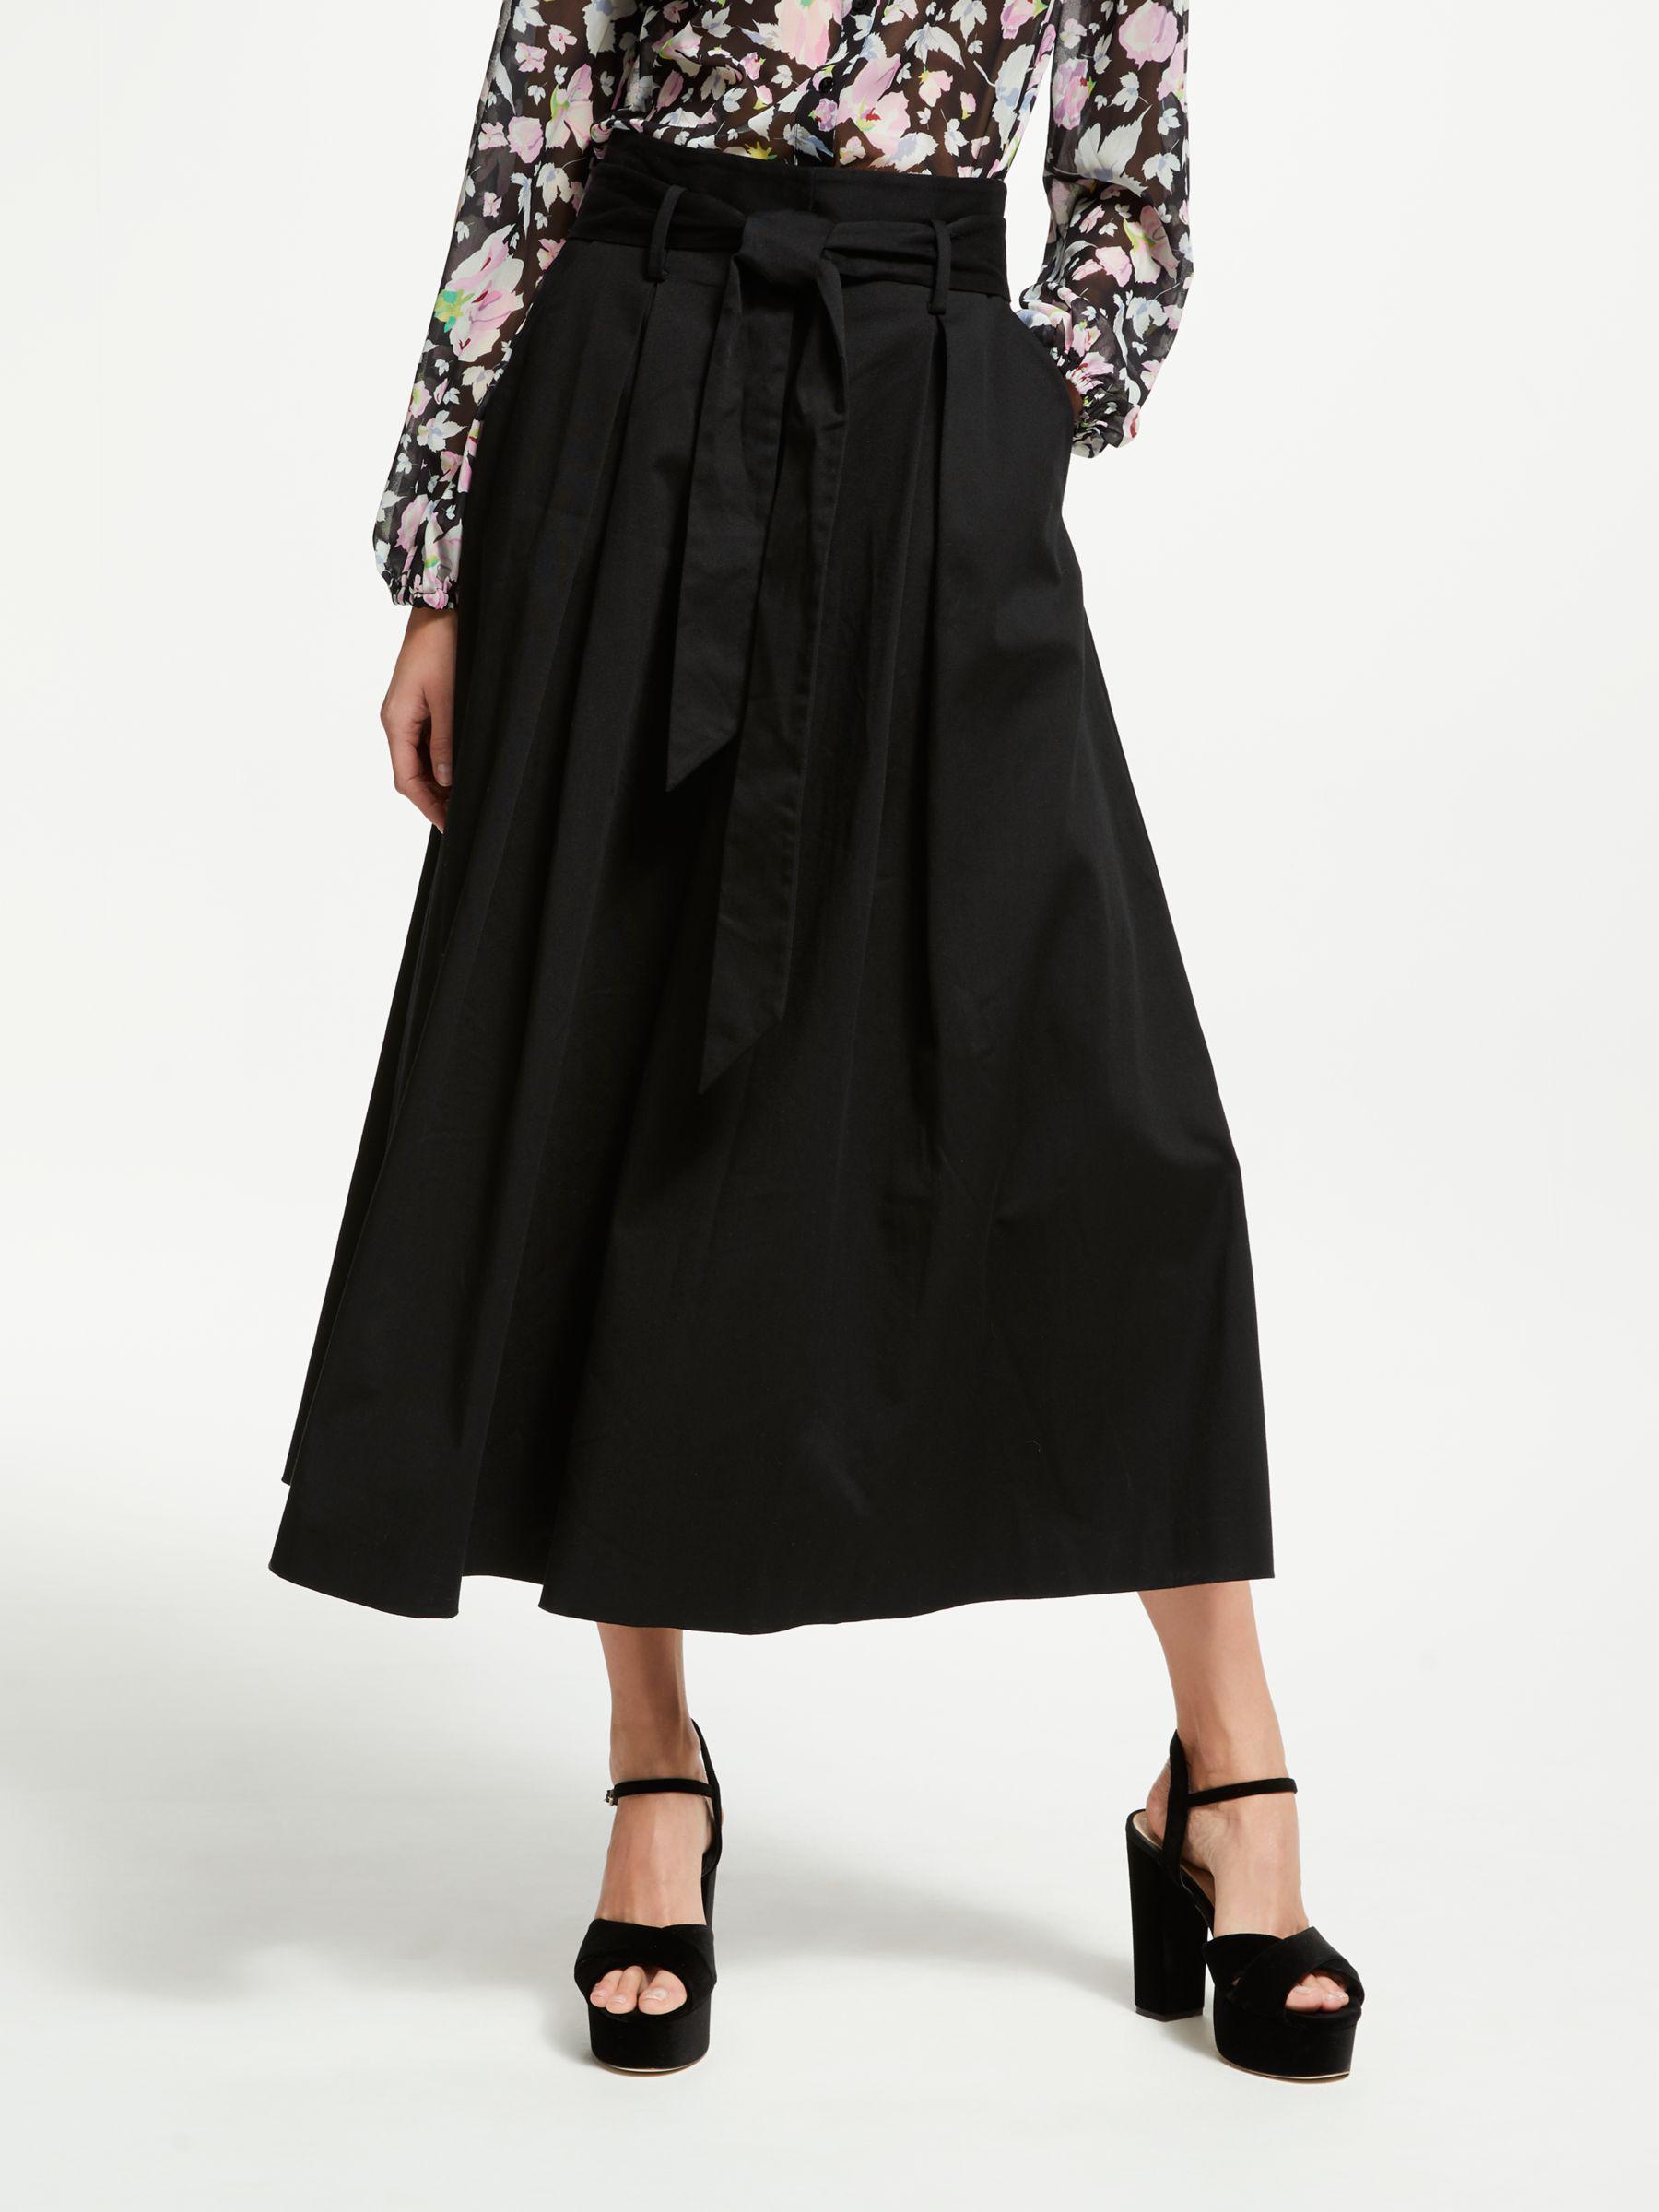 1035fe582012 Somerset by Alice Temperley Tie Waist Culottes in Black - Lyst